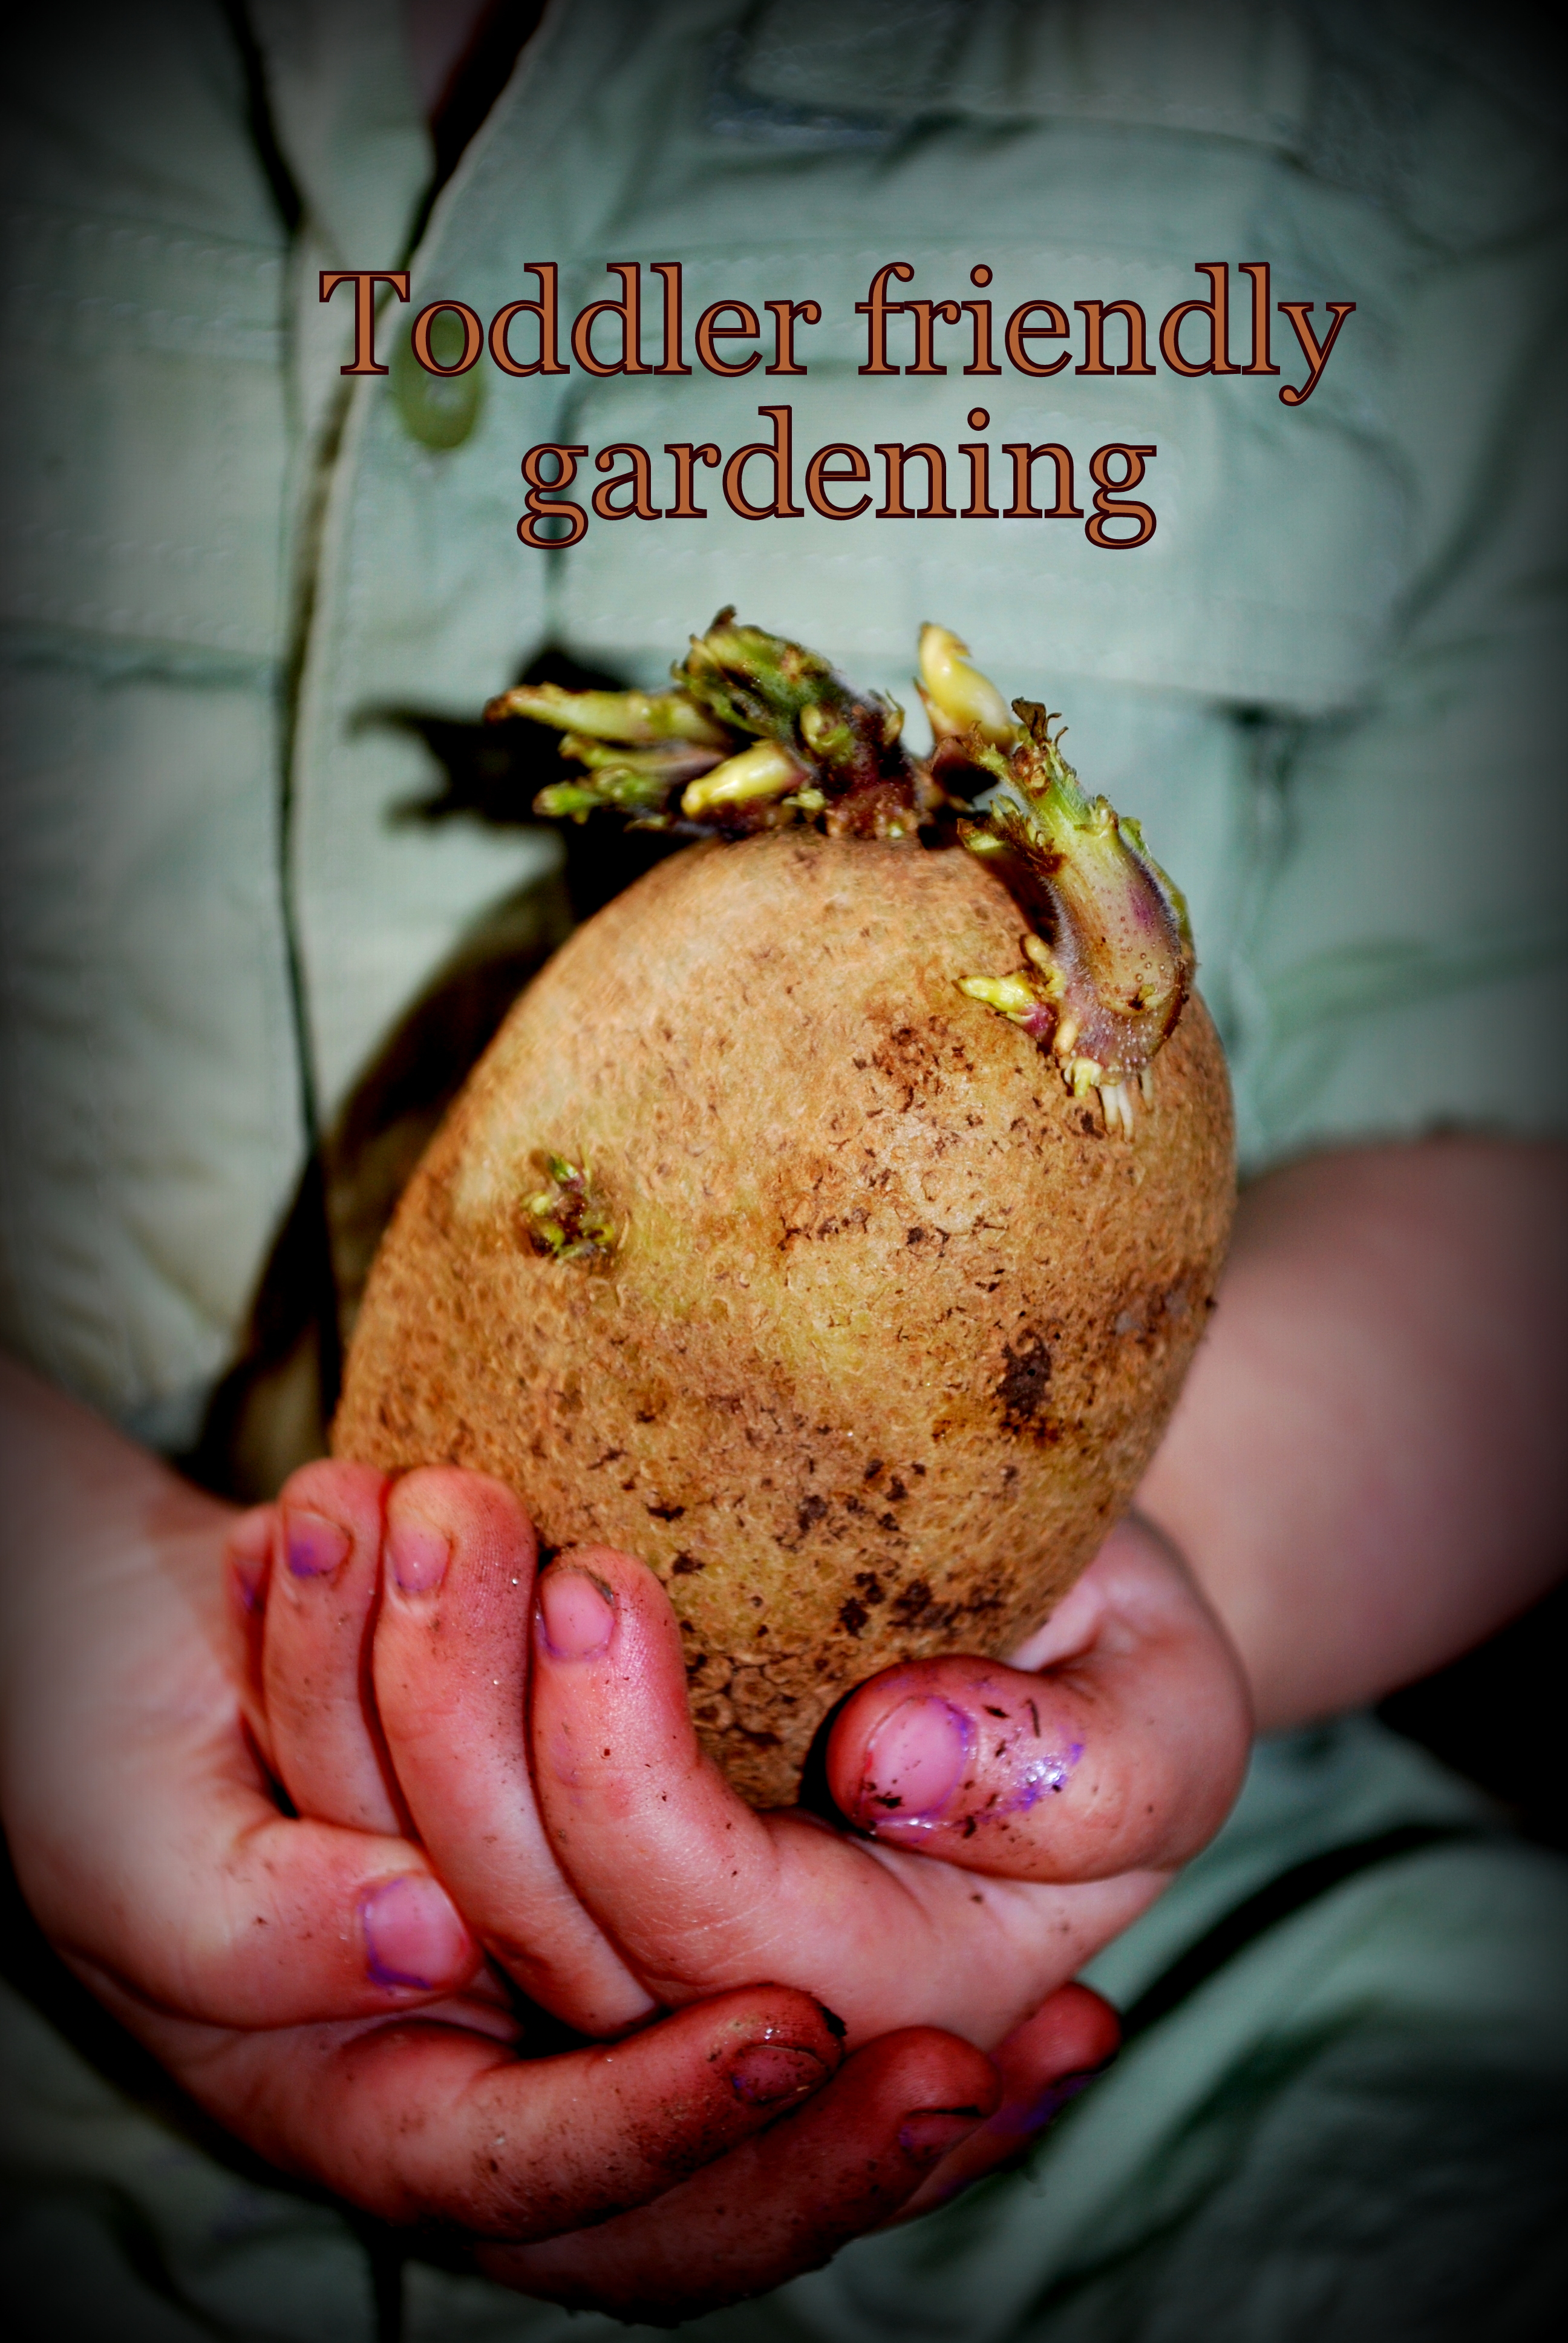 Toddler Friendly Gardening